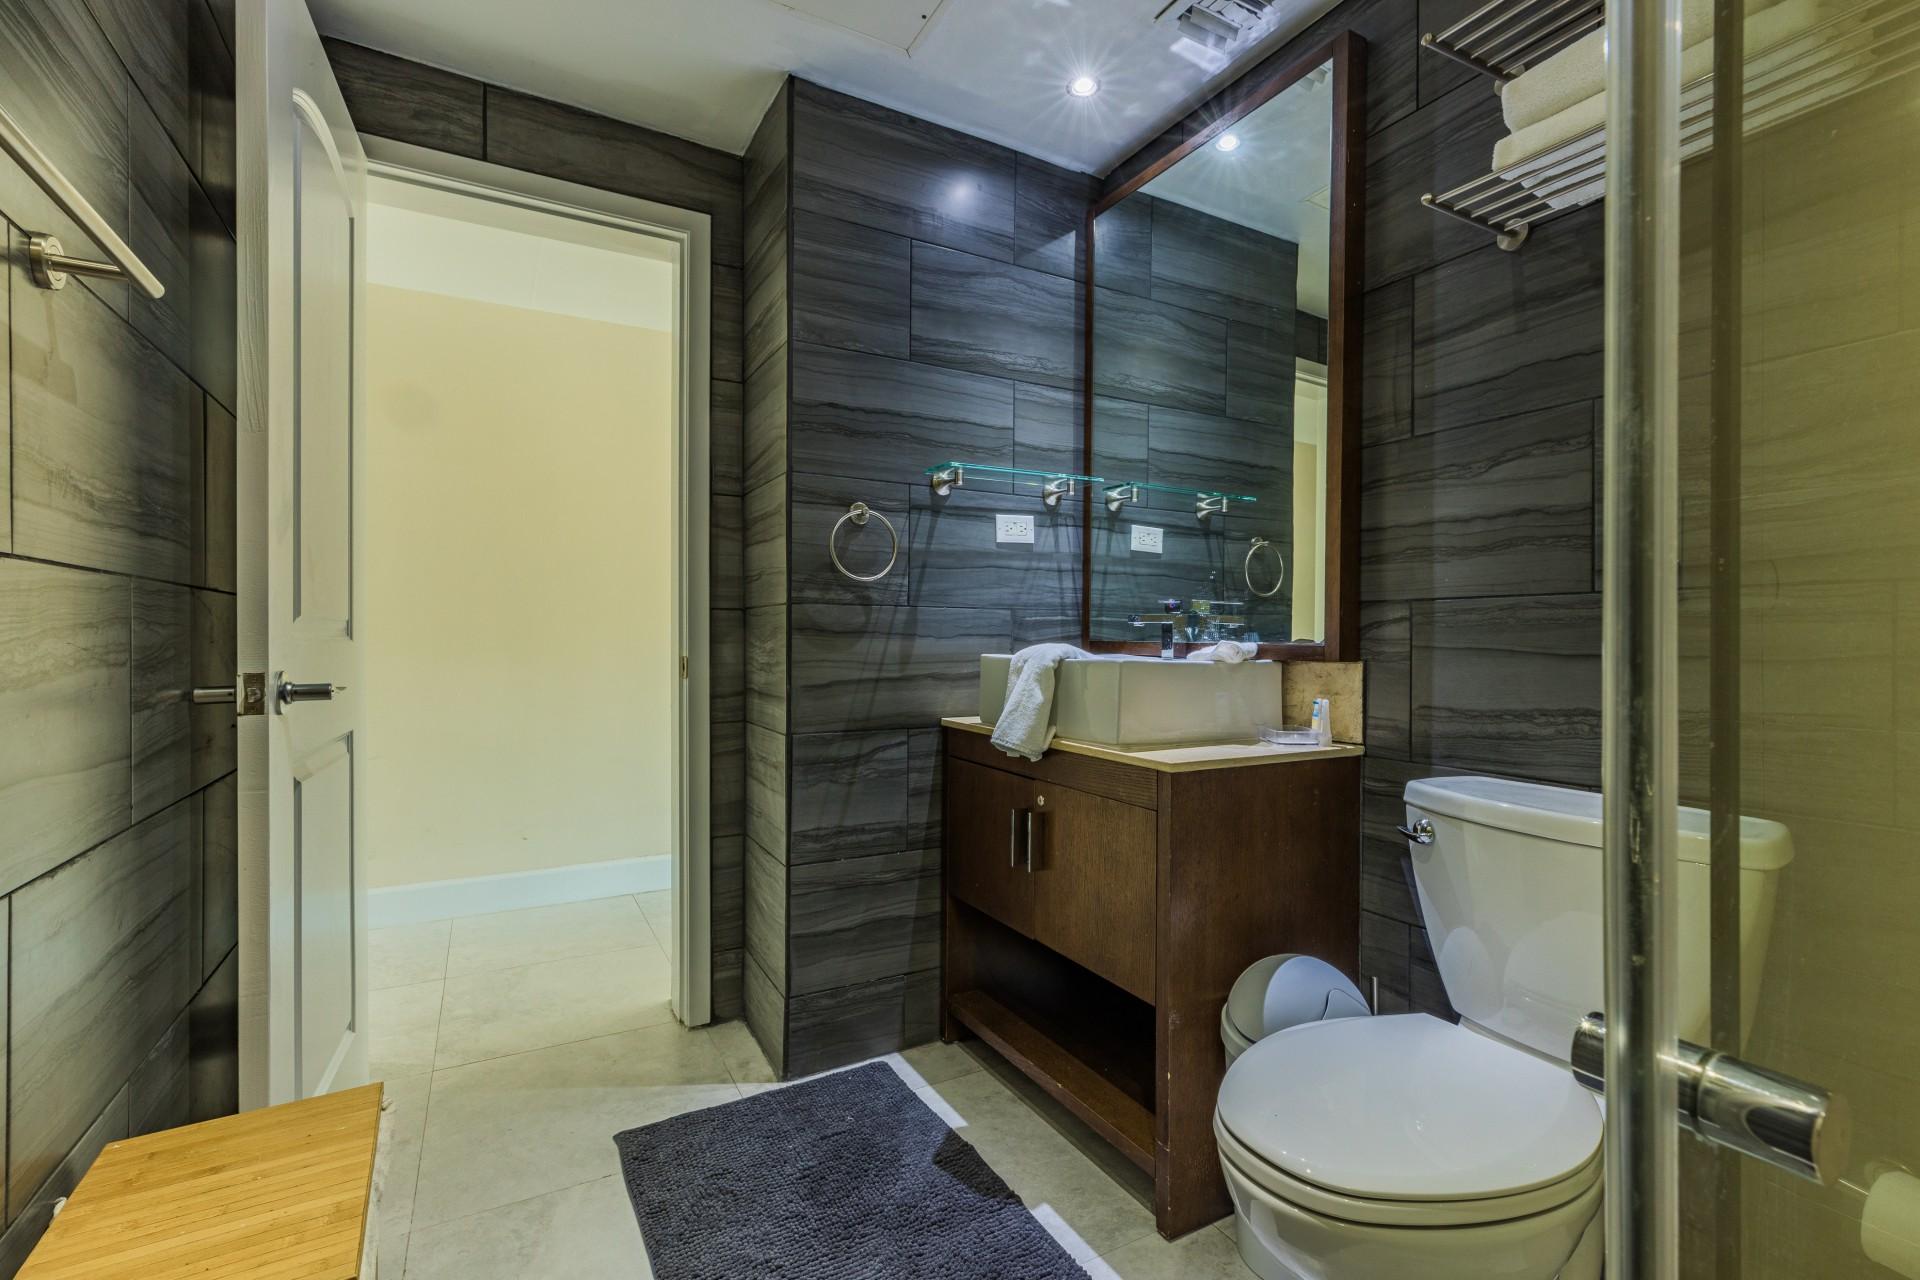 Oceania 134 1 Bedroom Ocean Front Condo for sale photo 15